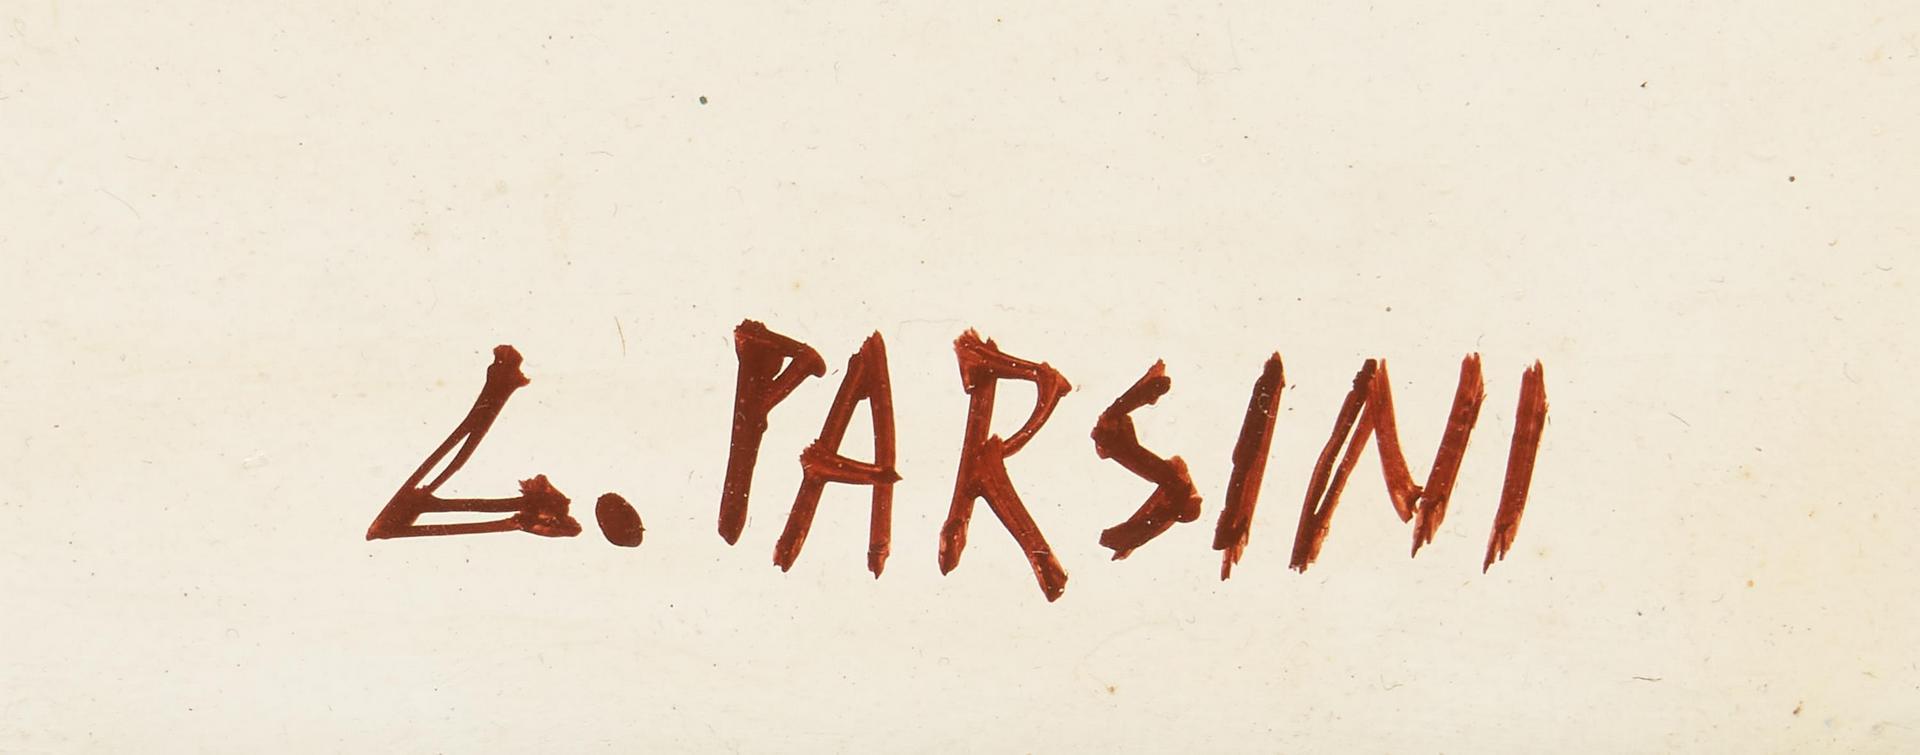 Lot 1156: 2 Luciana Parsini O/C, Landscape Paintings